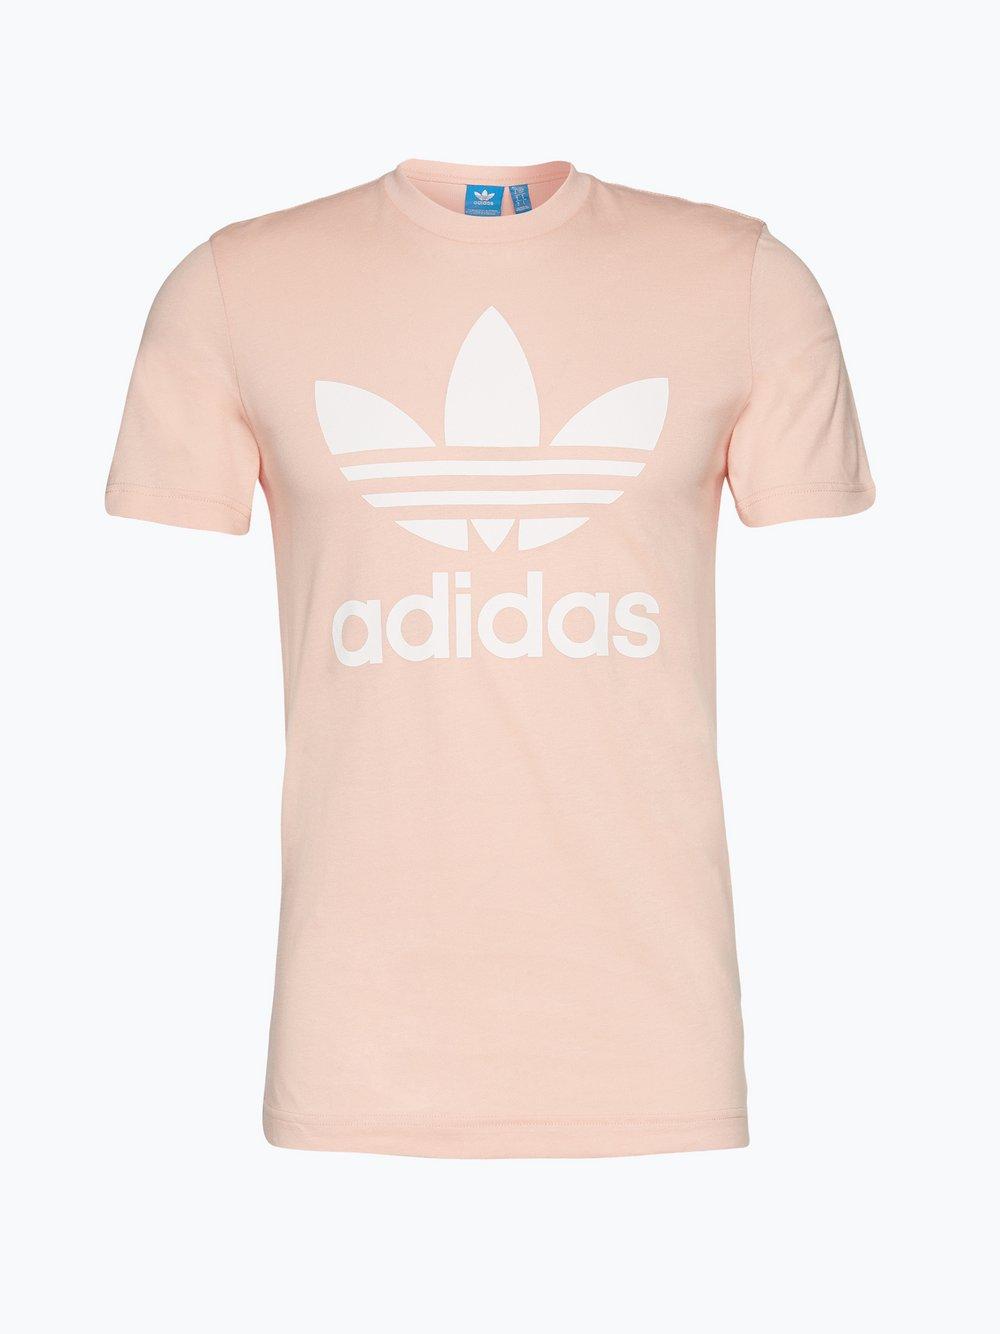 adidas herren t-shirt rosa